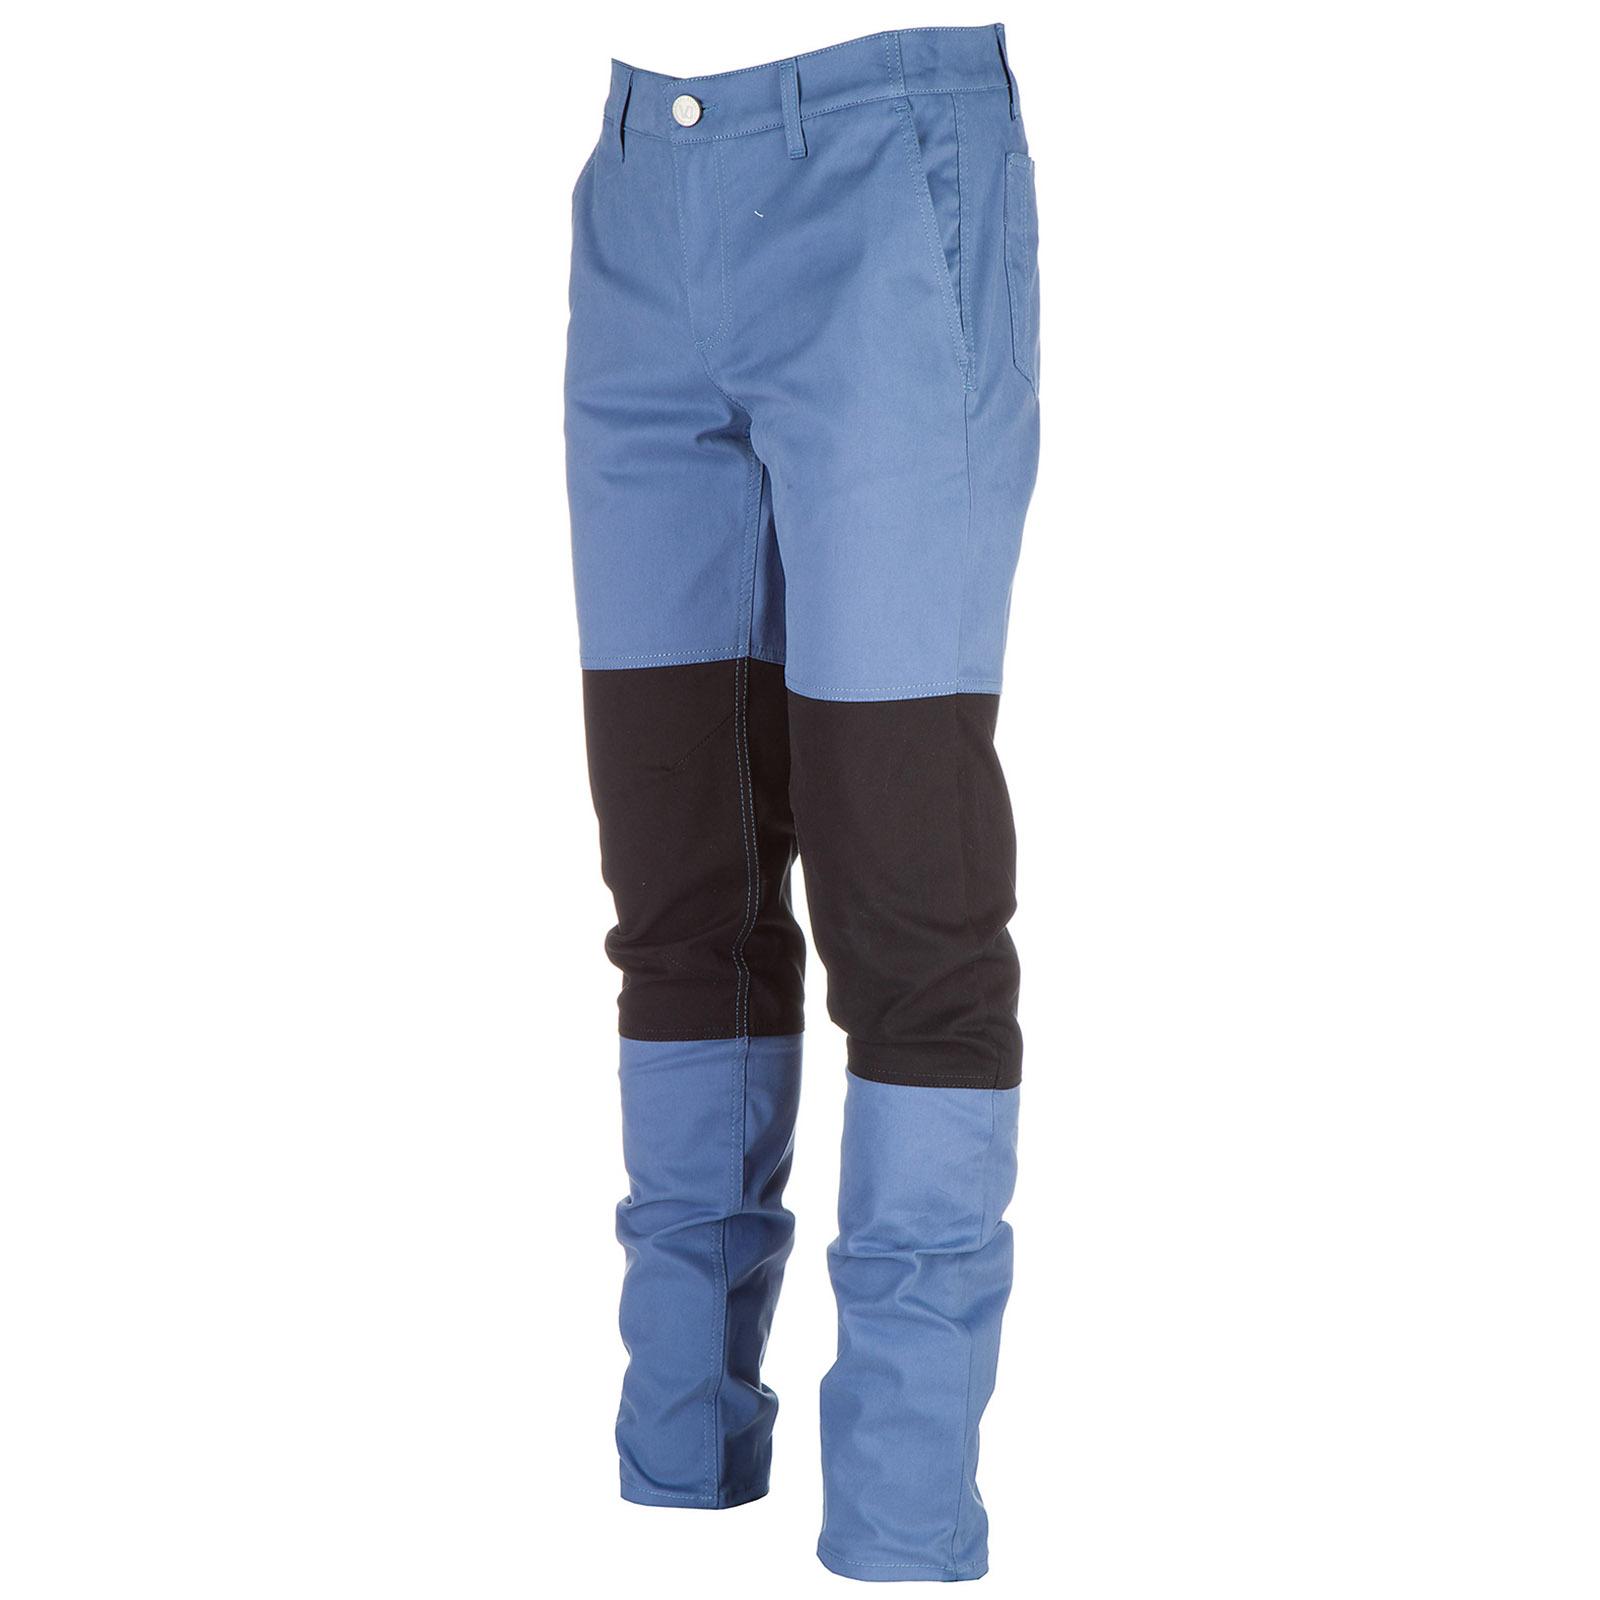 b88e61819a4b Pantalone Versace Jeans A2GQA114 QUP104 blu